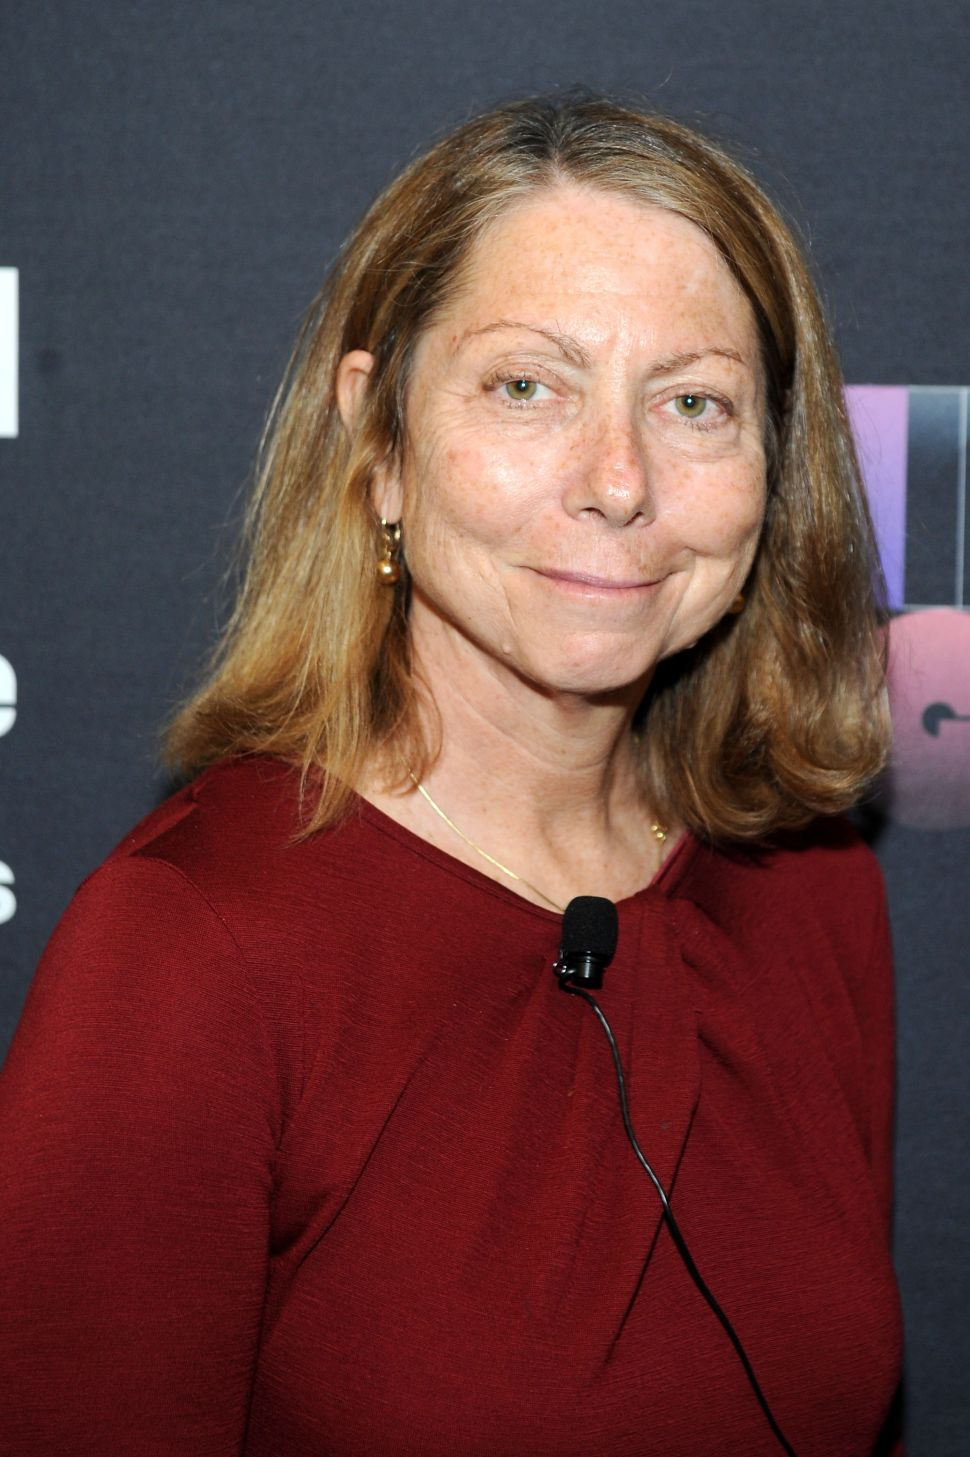 Jill Abramson Leaving The New York Times; Dean Baquet Becomes Executive Editor